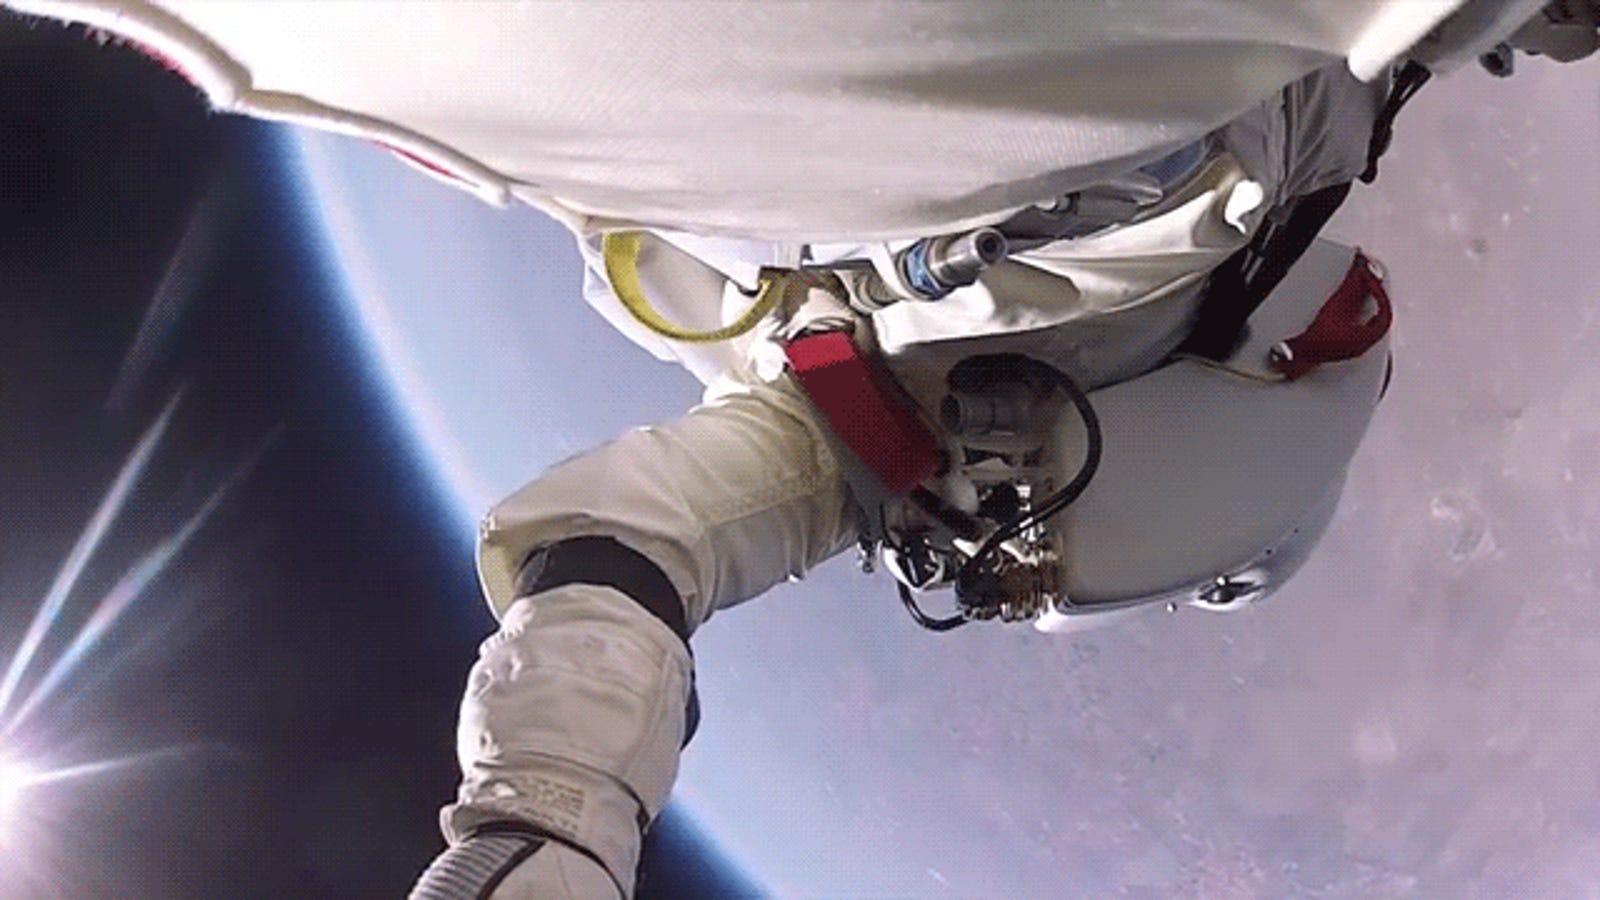 Incredible new video of Felix Baumgartner's space jump